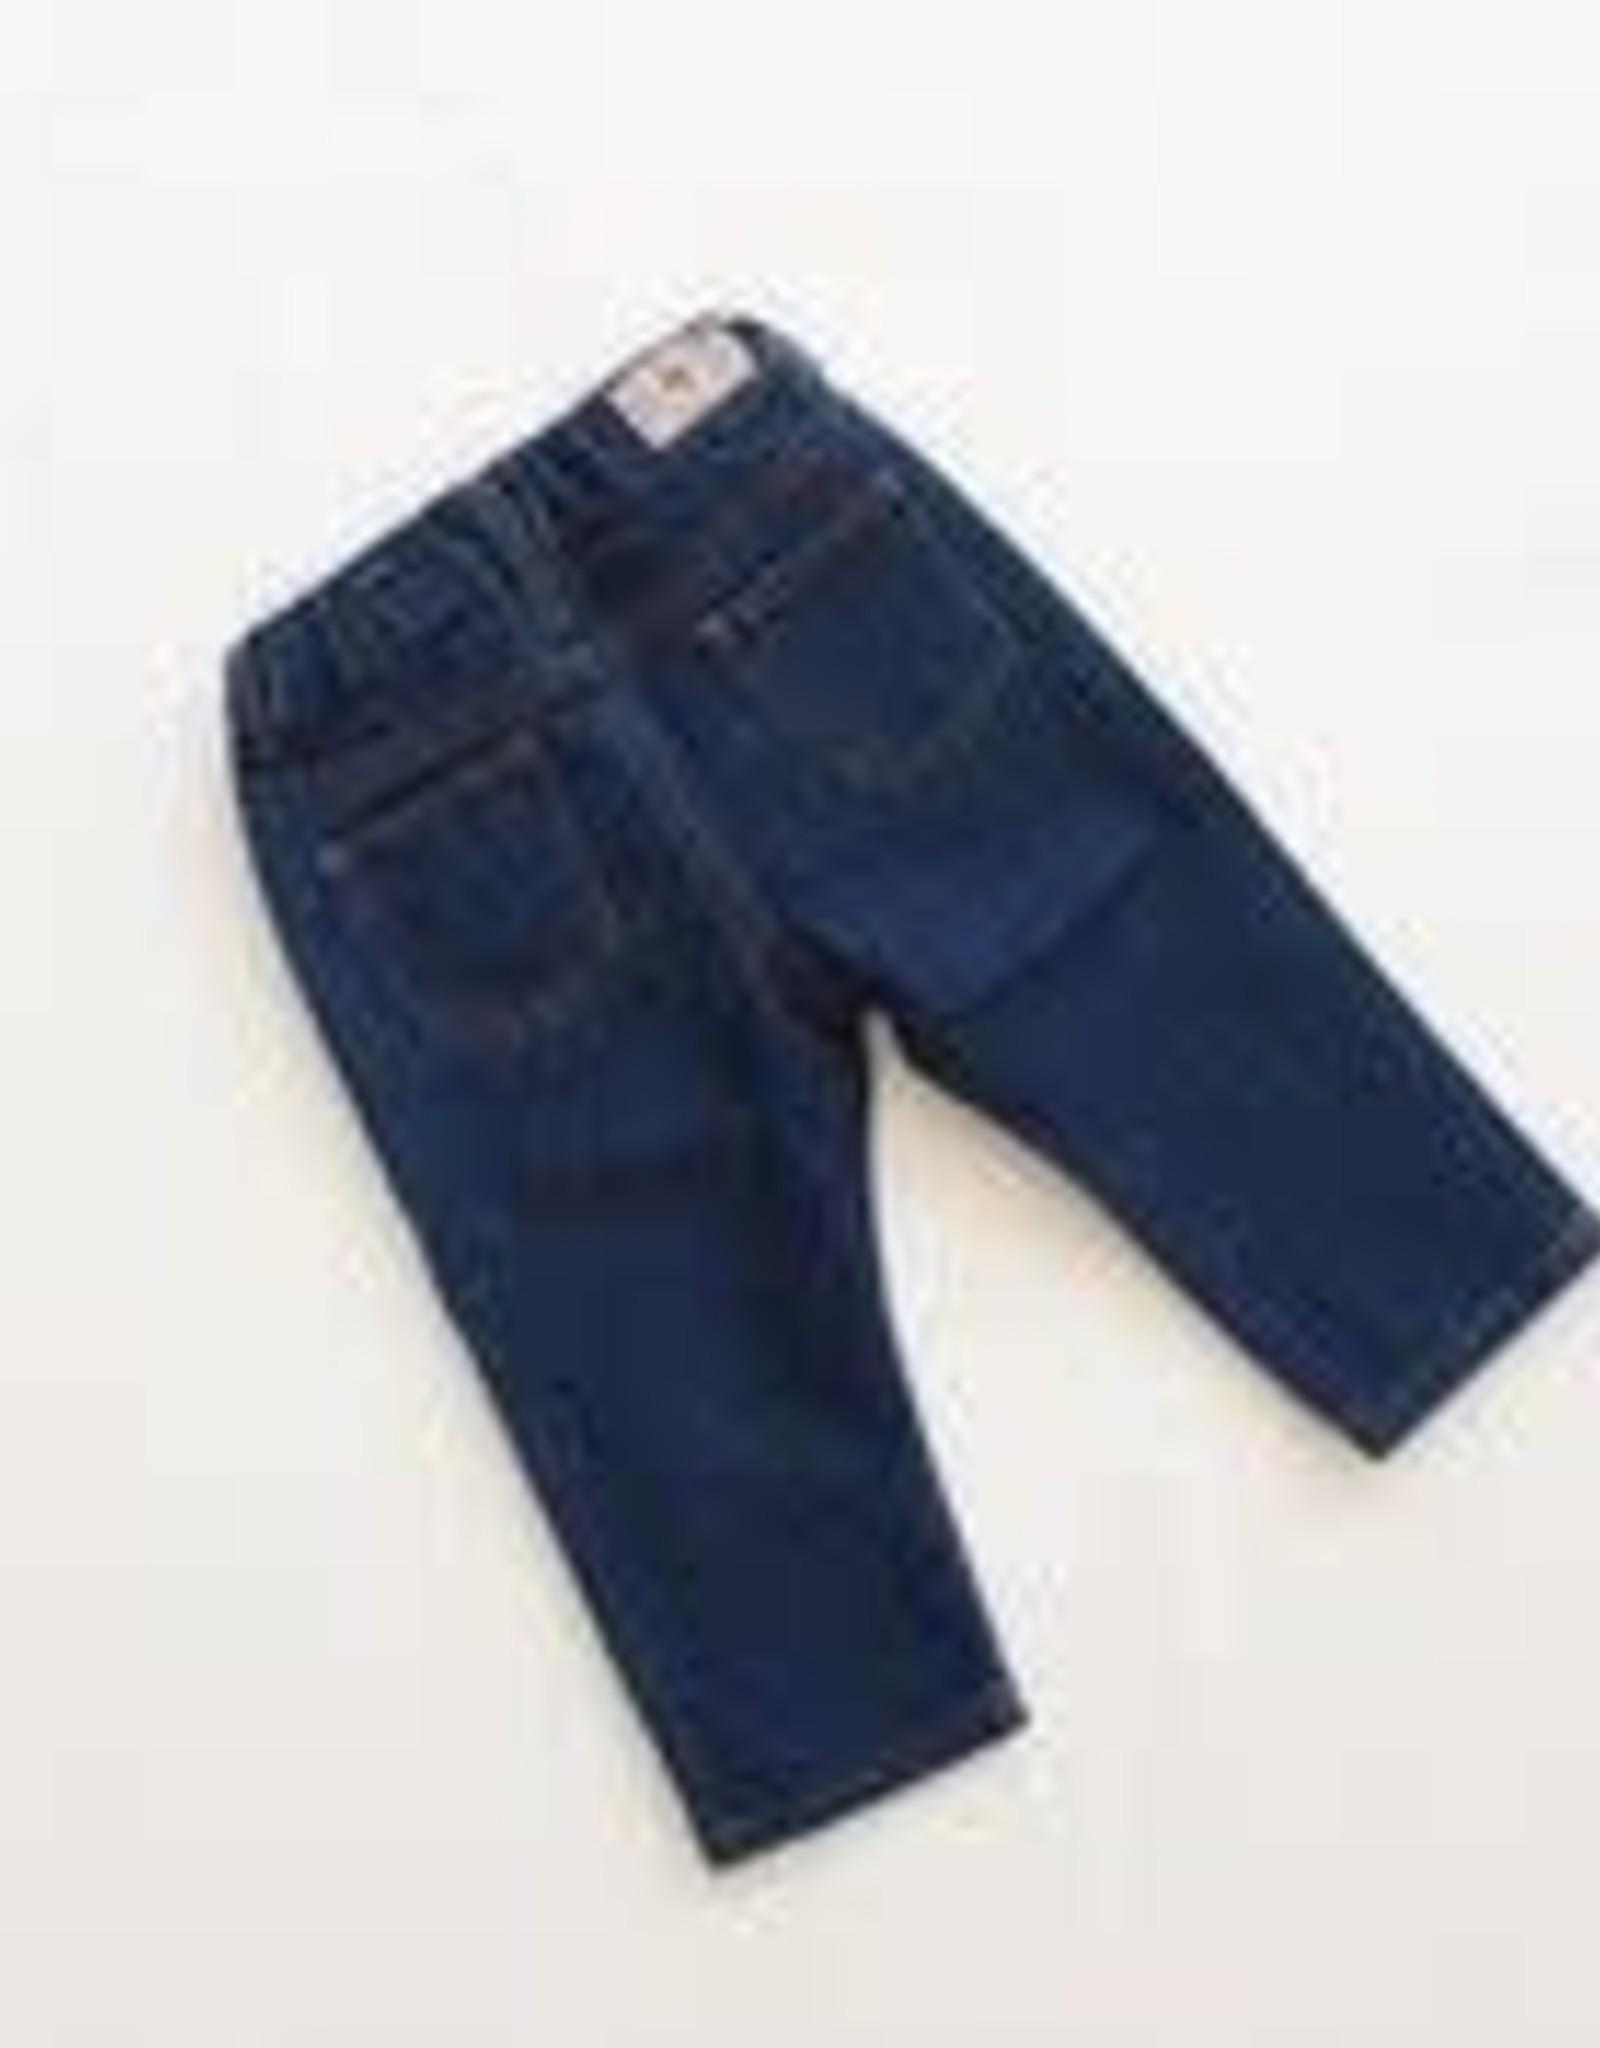 Fin & Vince Vintage Jeans